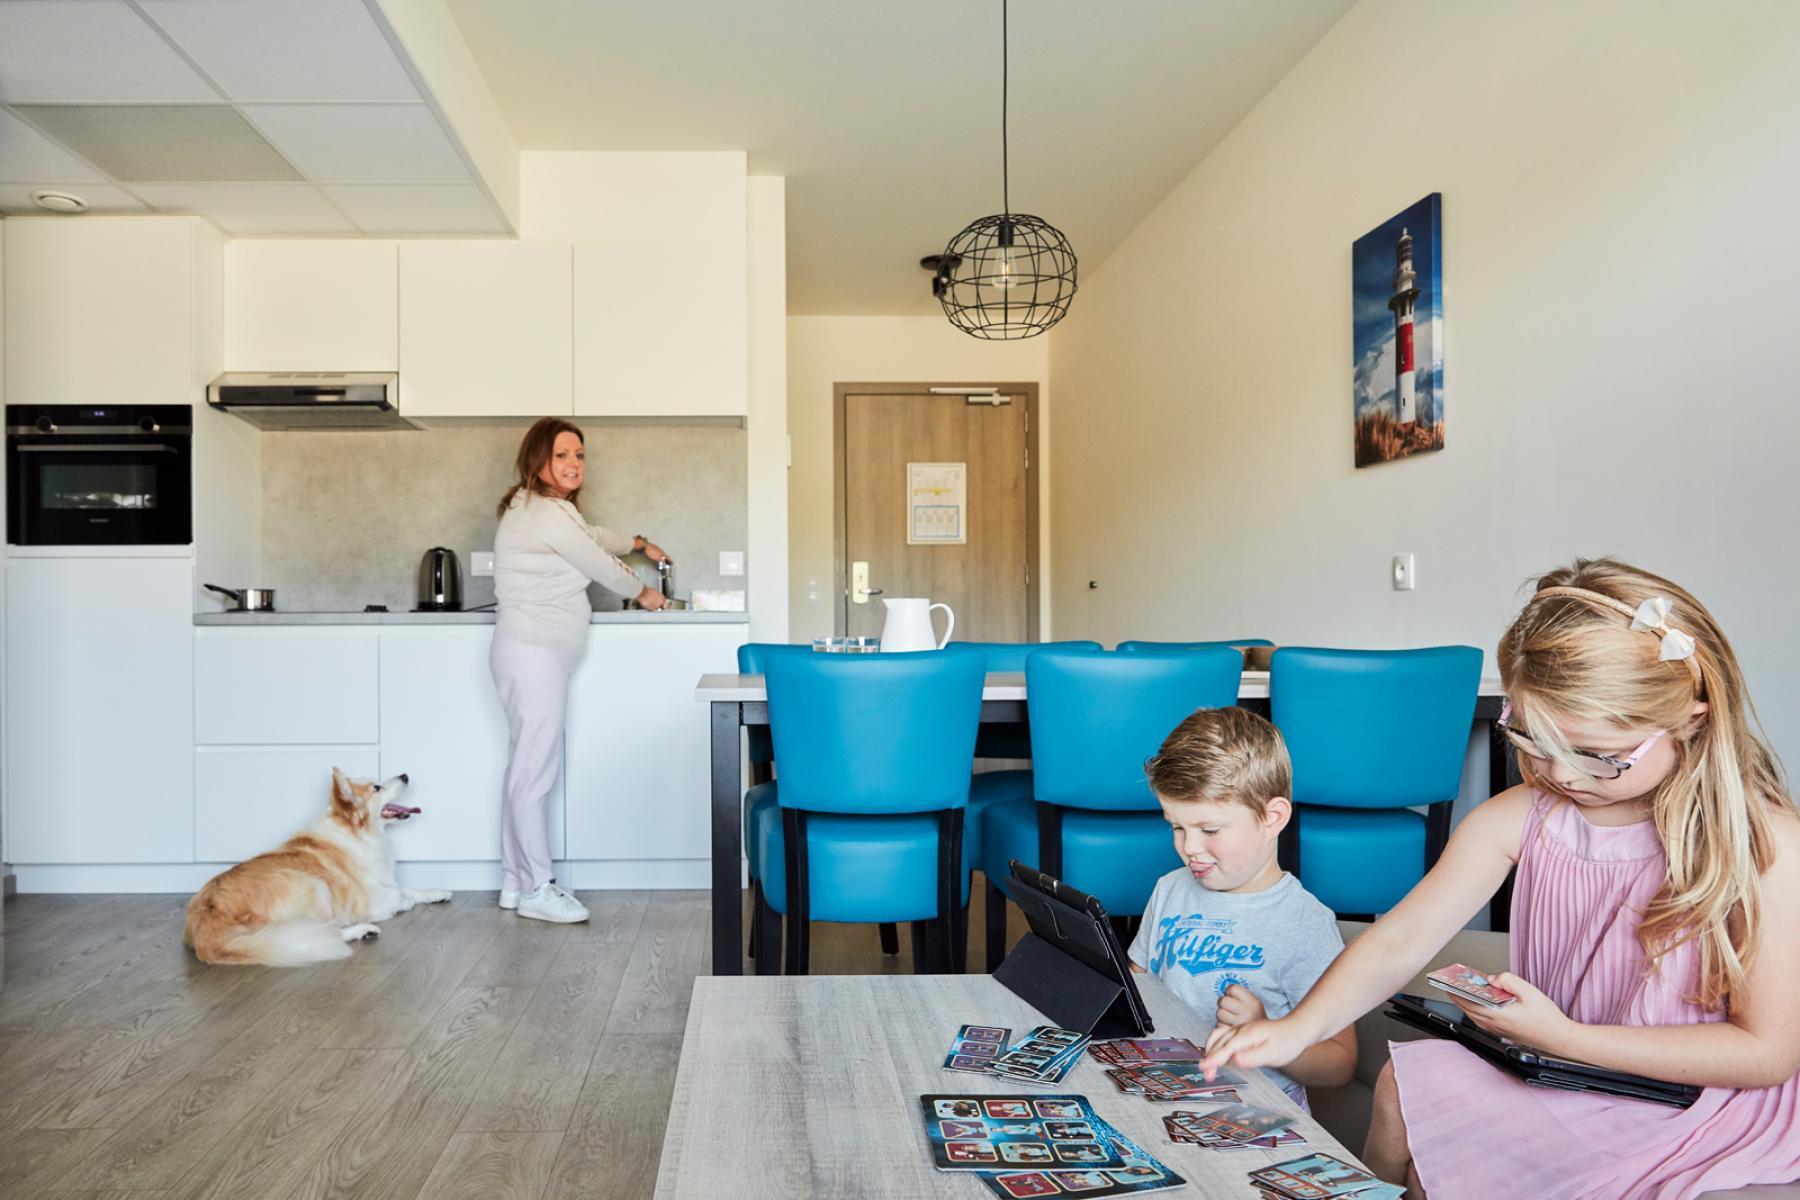 Visit-Nieuwpoort Holiday Suites